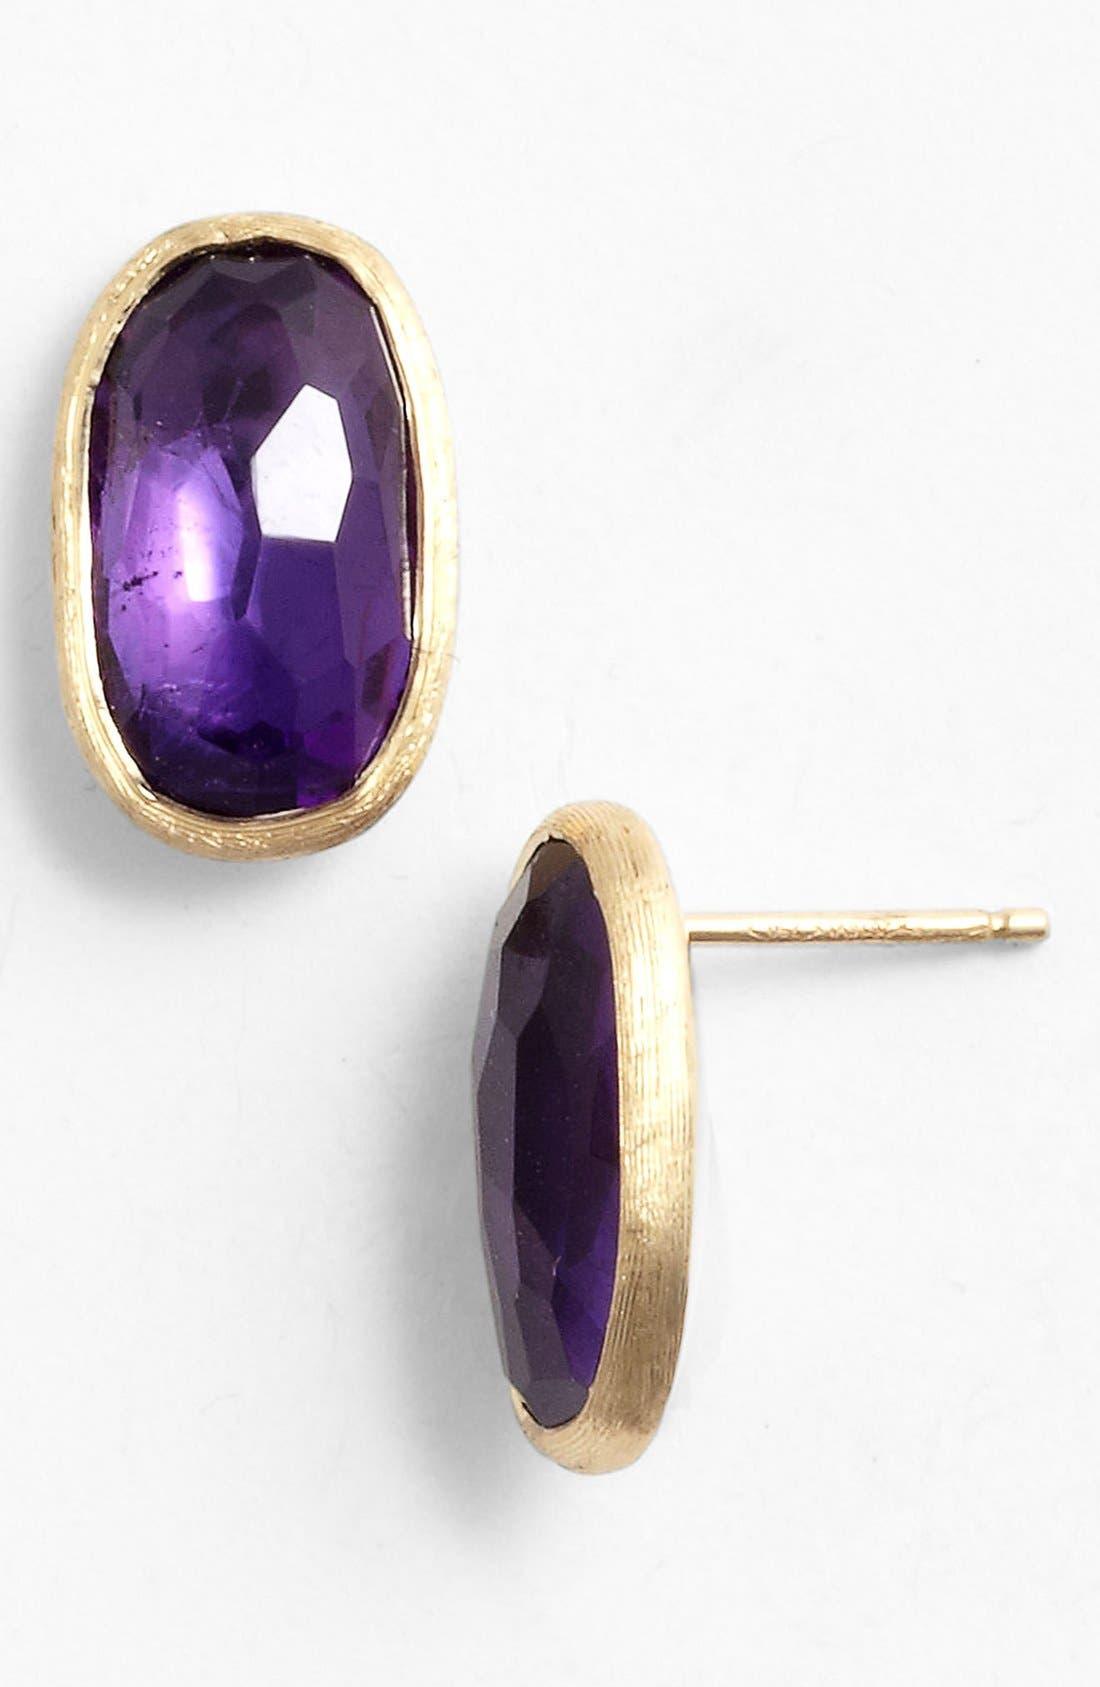 Main Image - Marco Bicego 'Murano' Stud Earrings